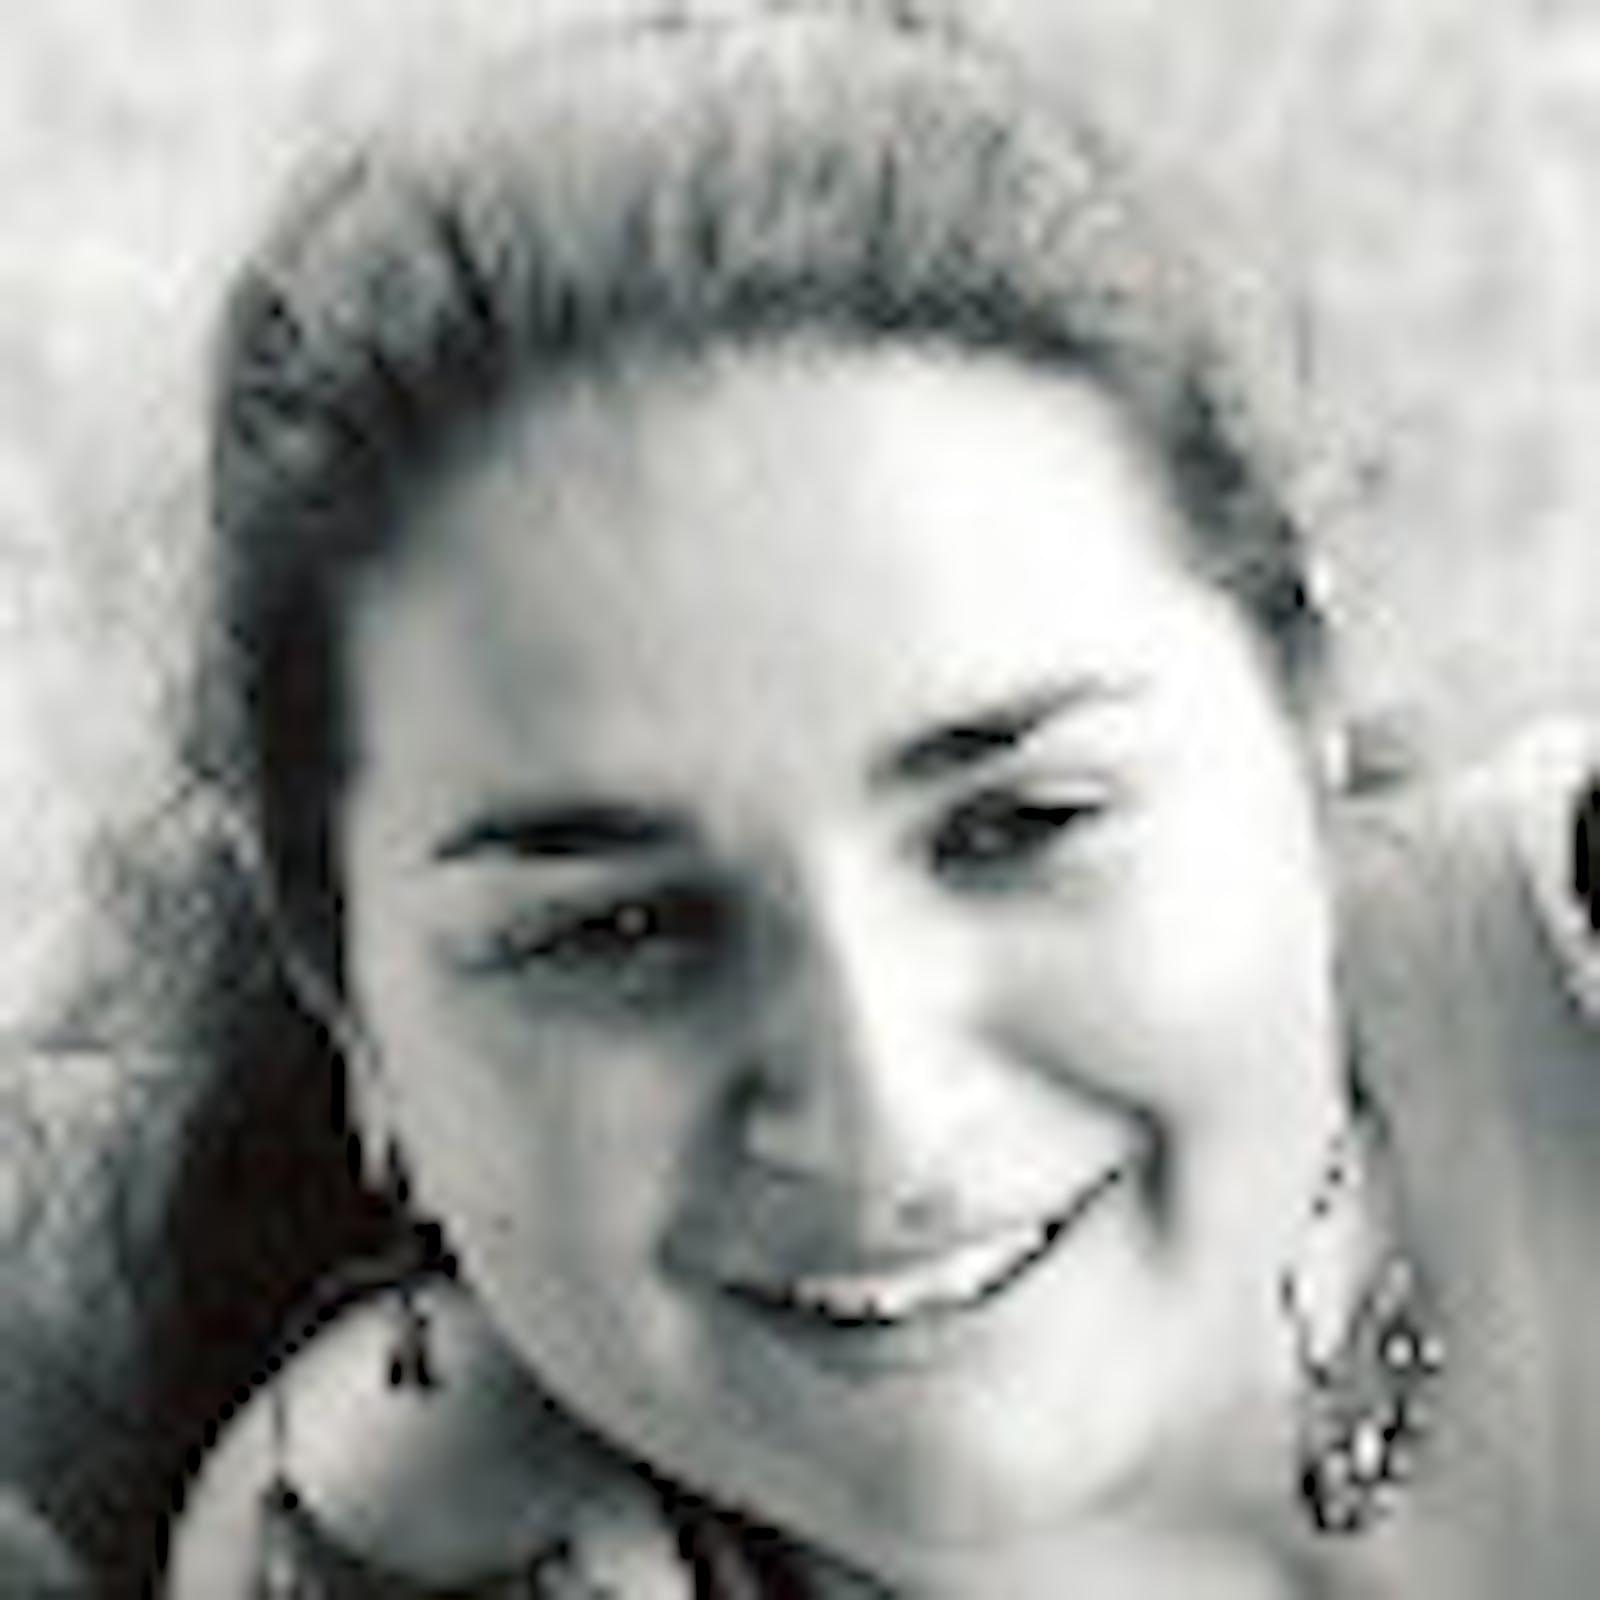 Shaheen Baig